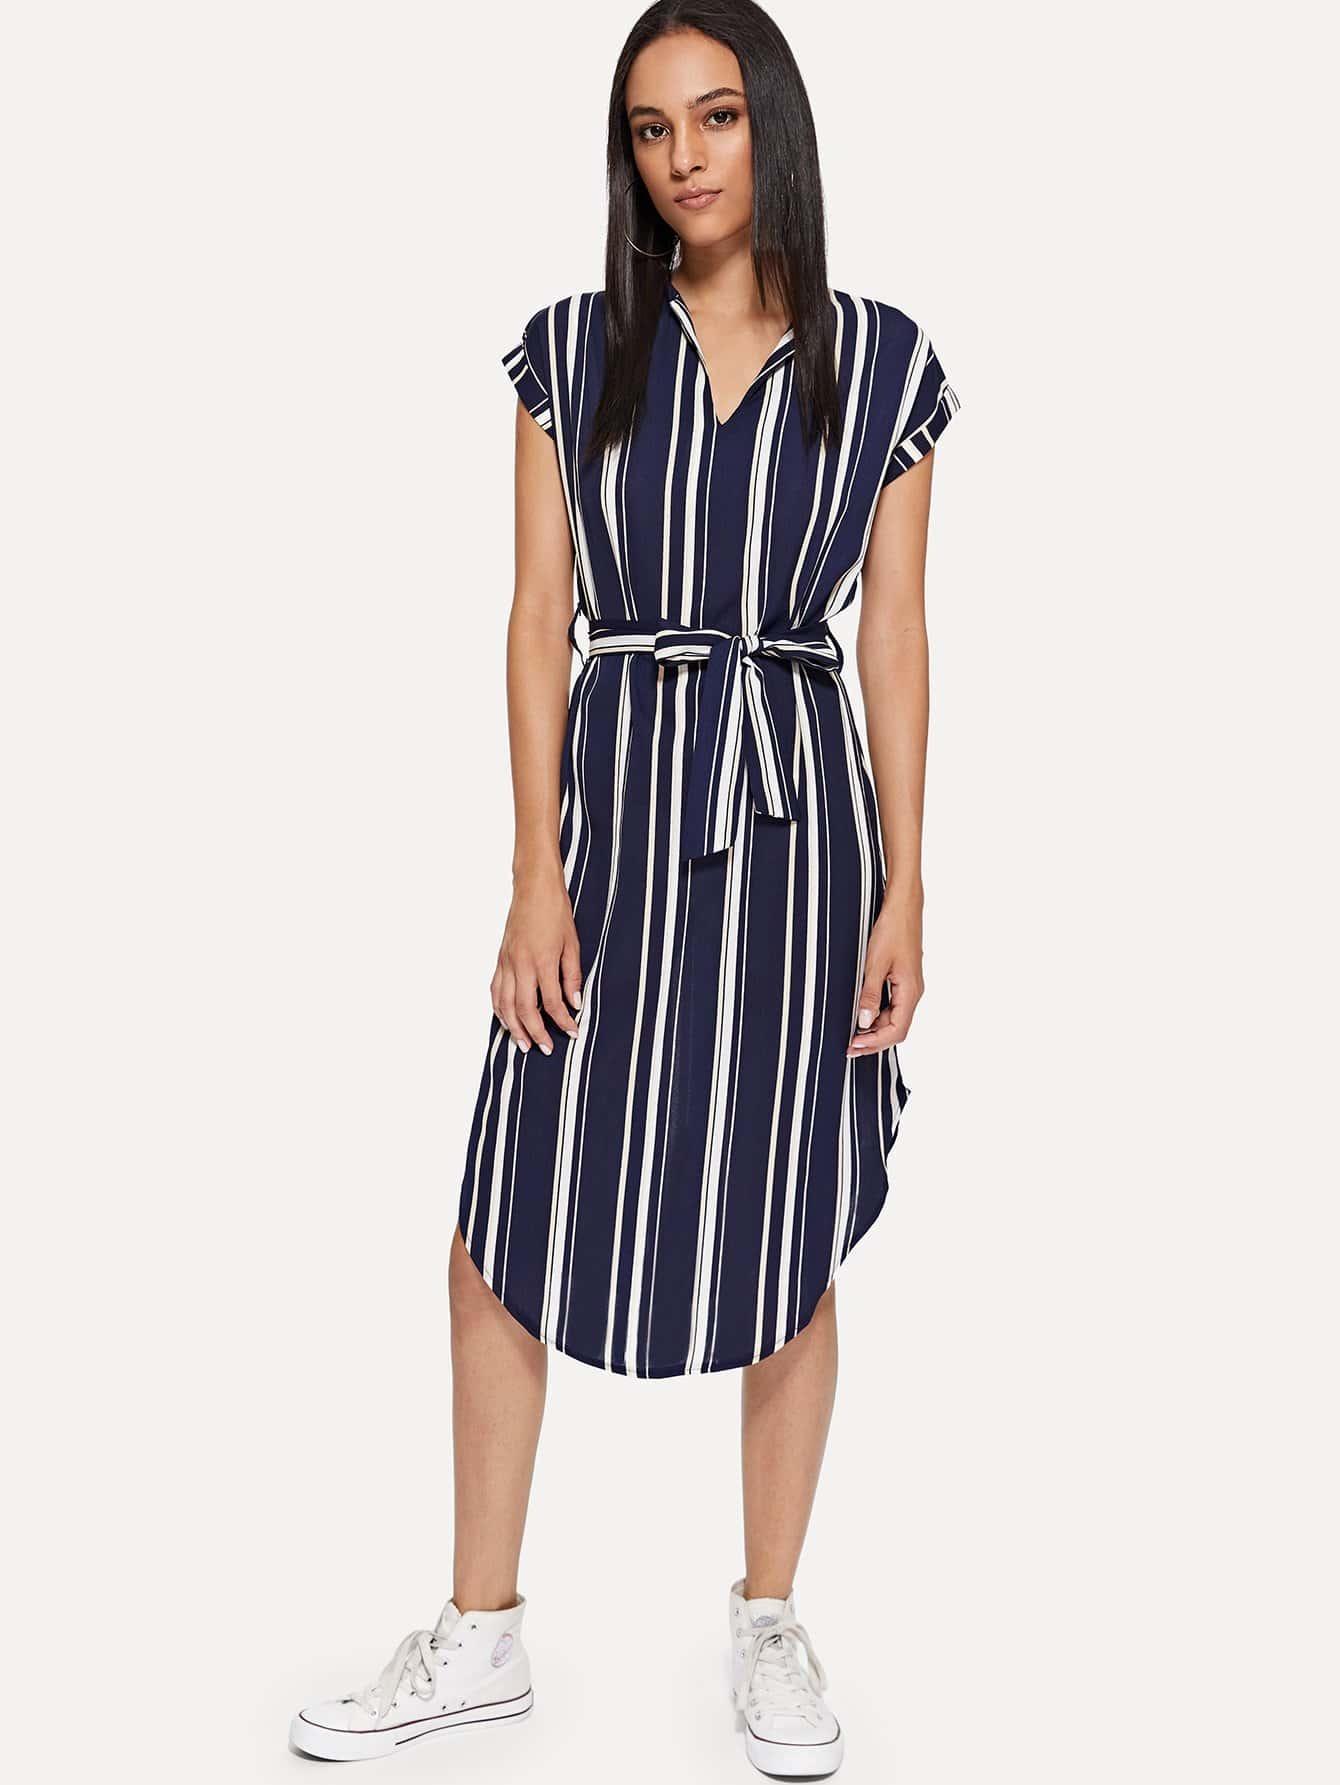 Knot Detail Striped Dress knot detail striped bodysuit